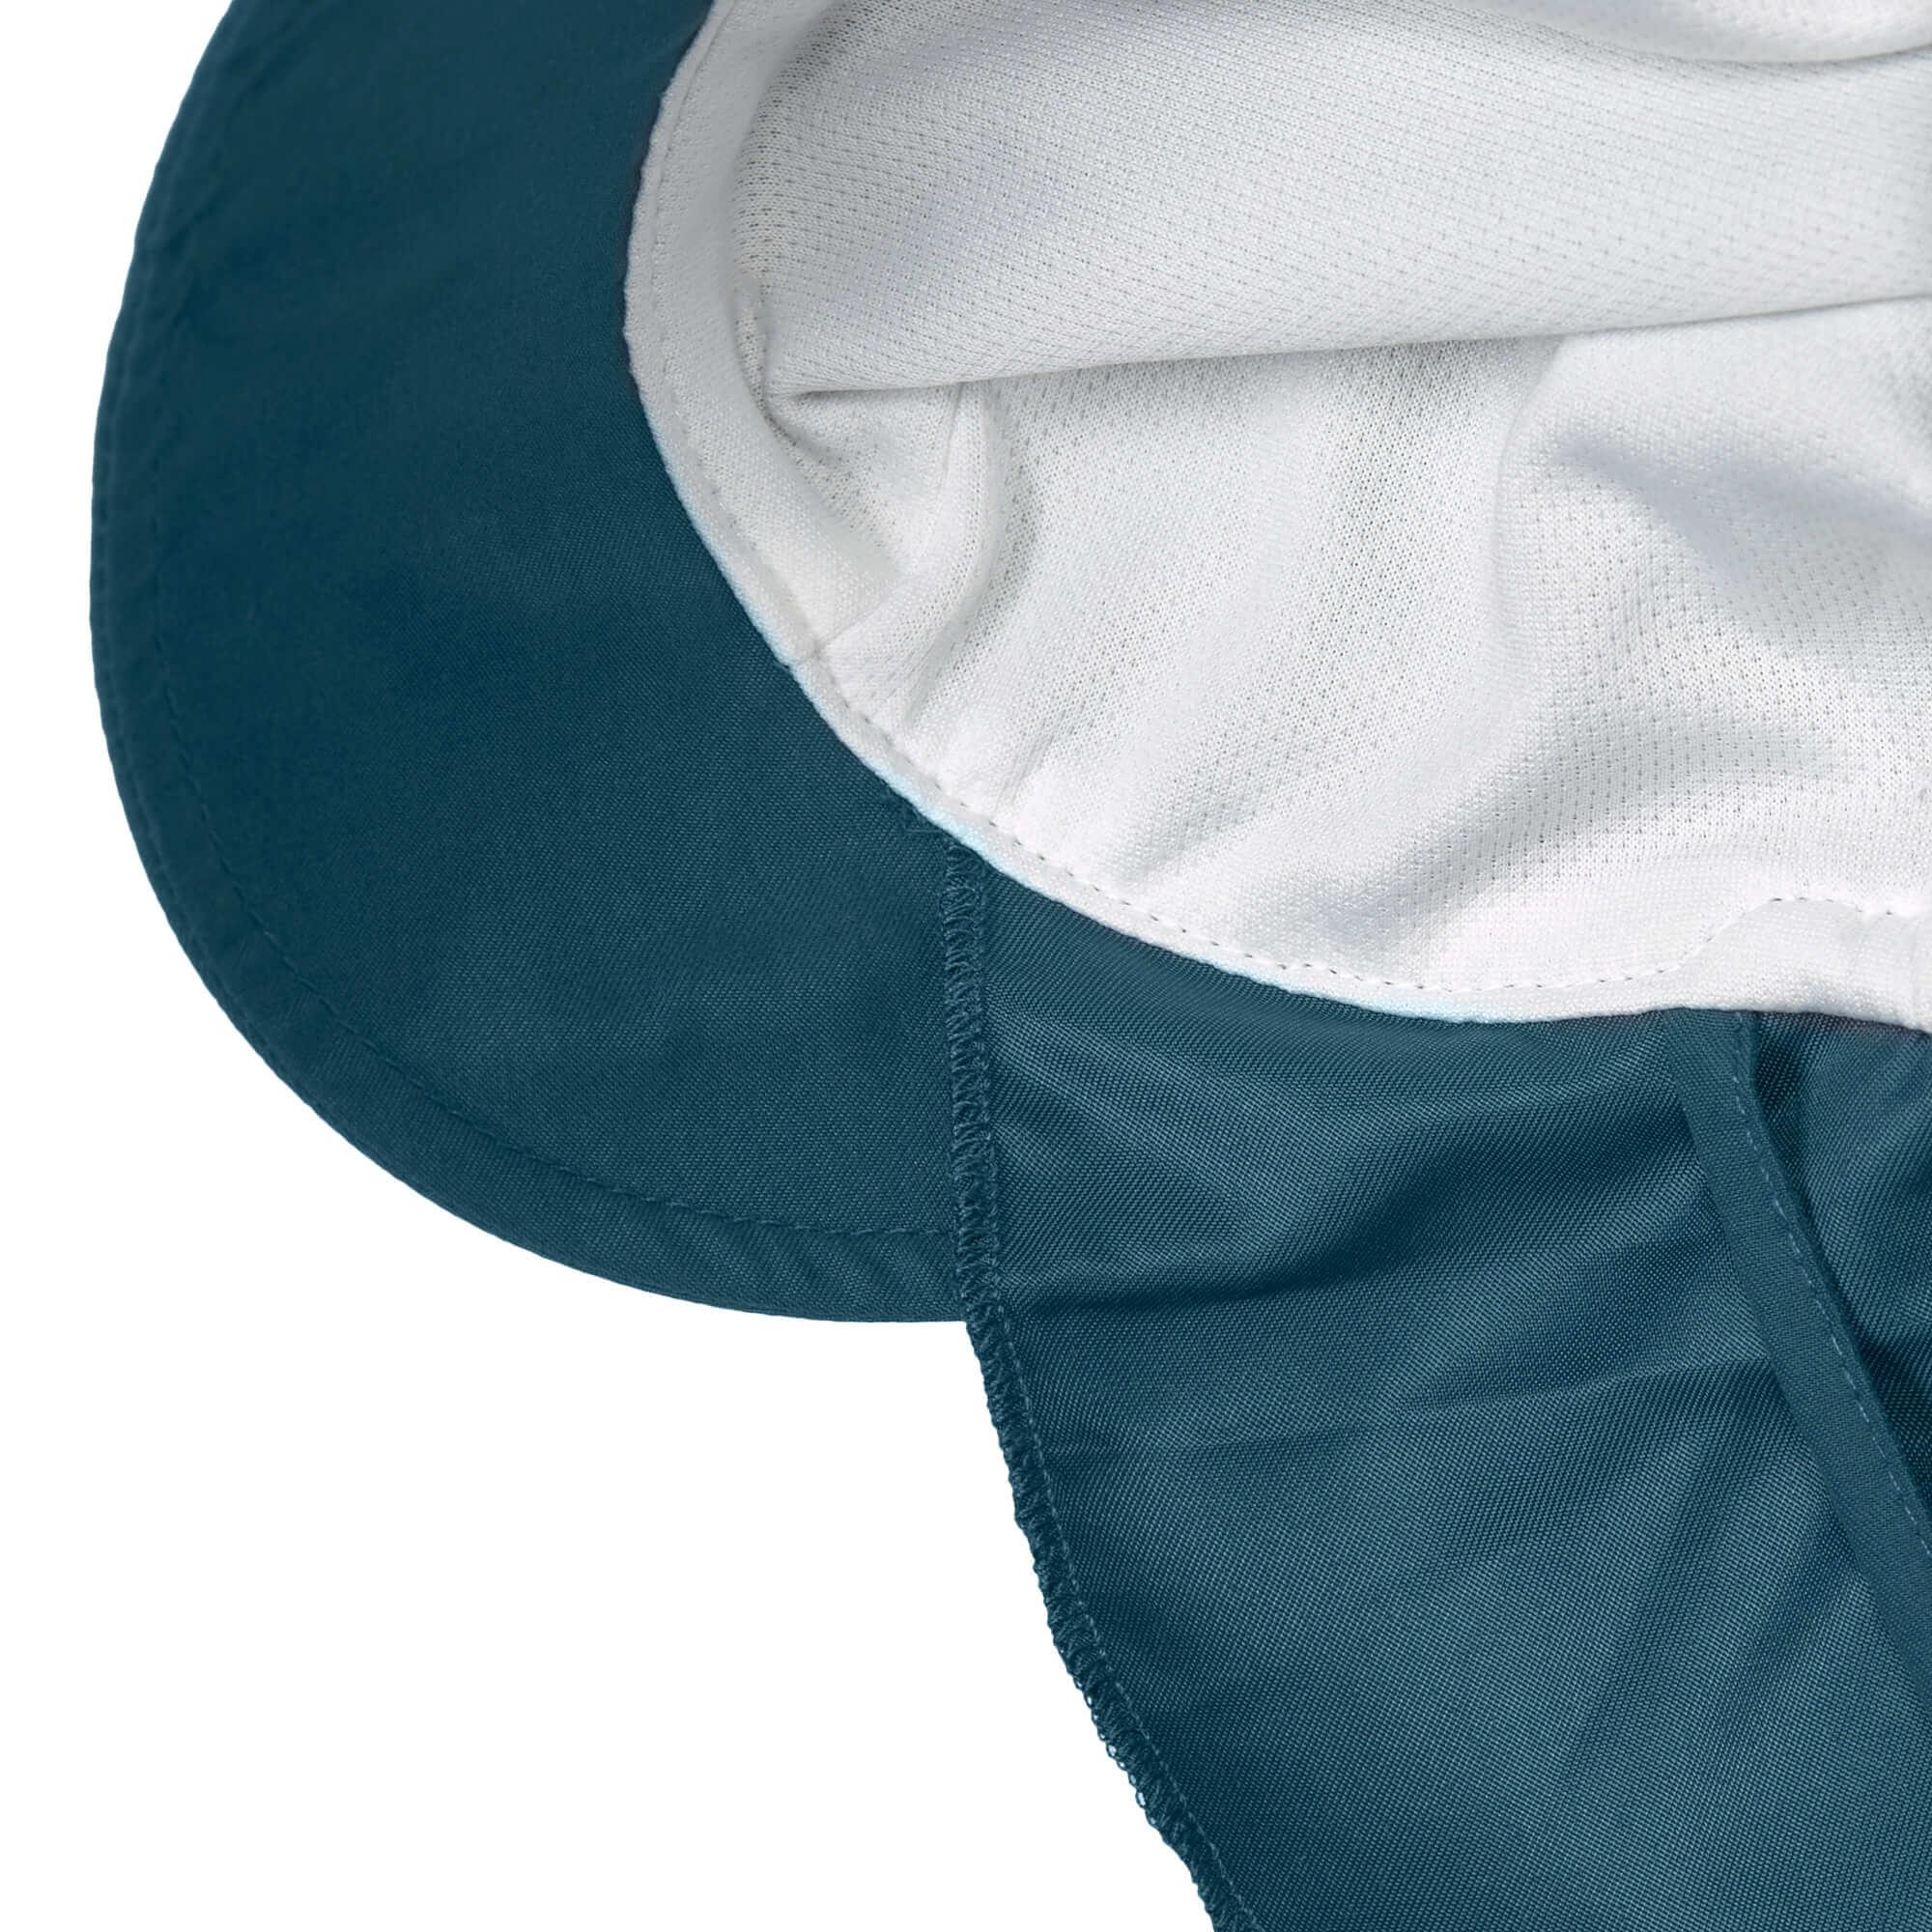 Lässig Lässig Splash & Fun Sun Protection Zonnehoed Flaphoed met UV bescherming - Navy (SS21) 19-36 maanden, Maat: 50/51